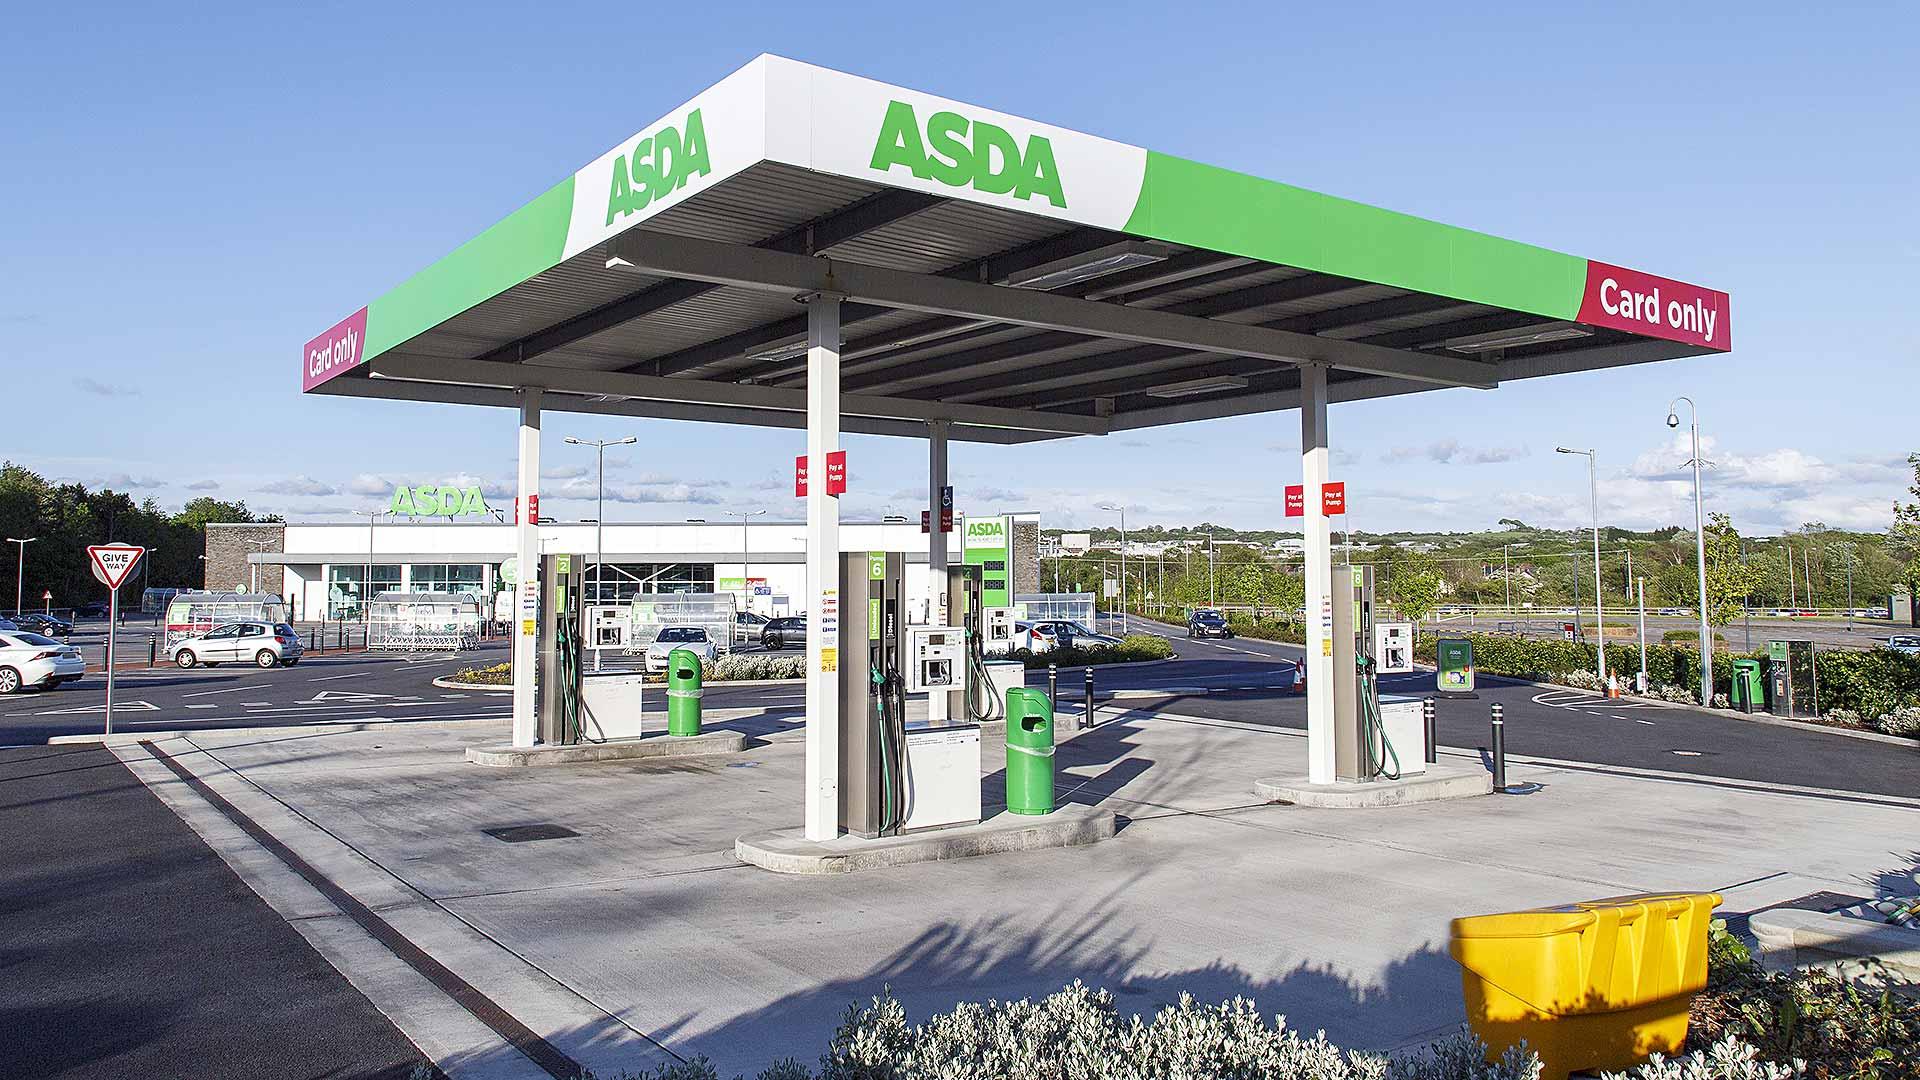 Asda fuel filling station